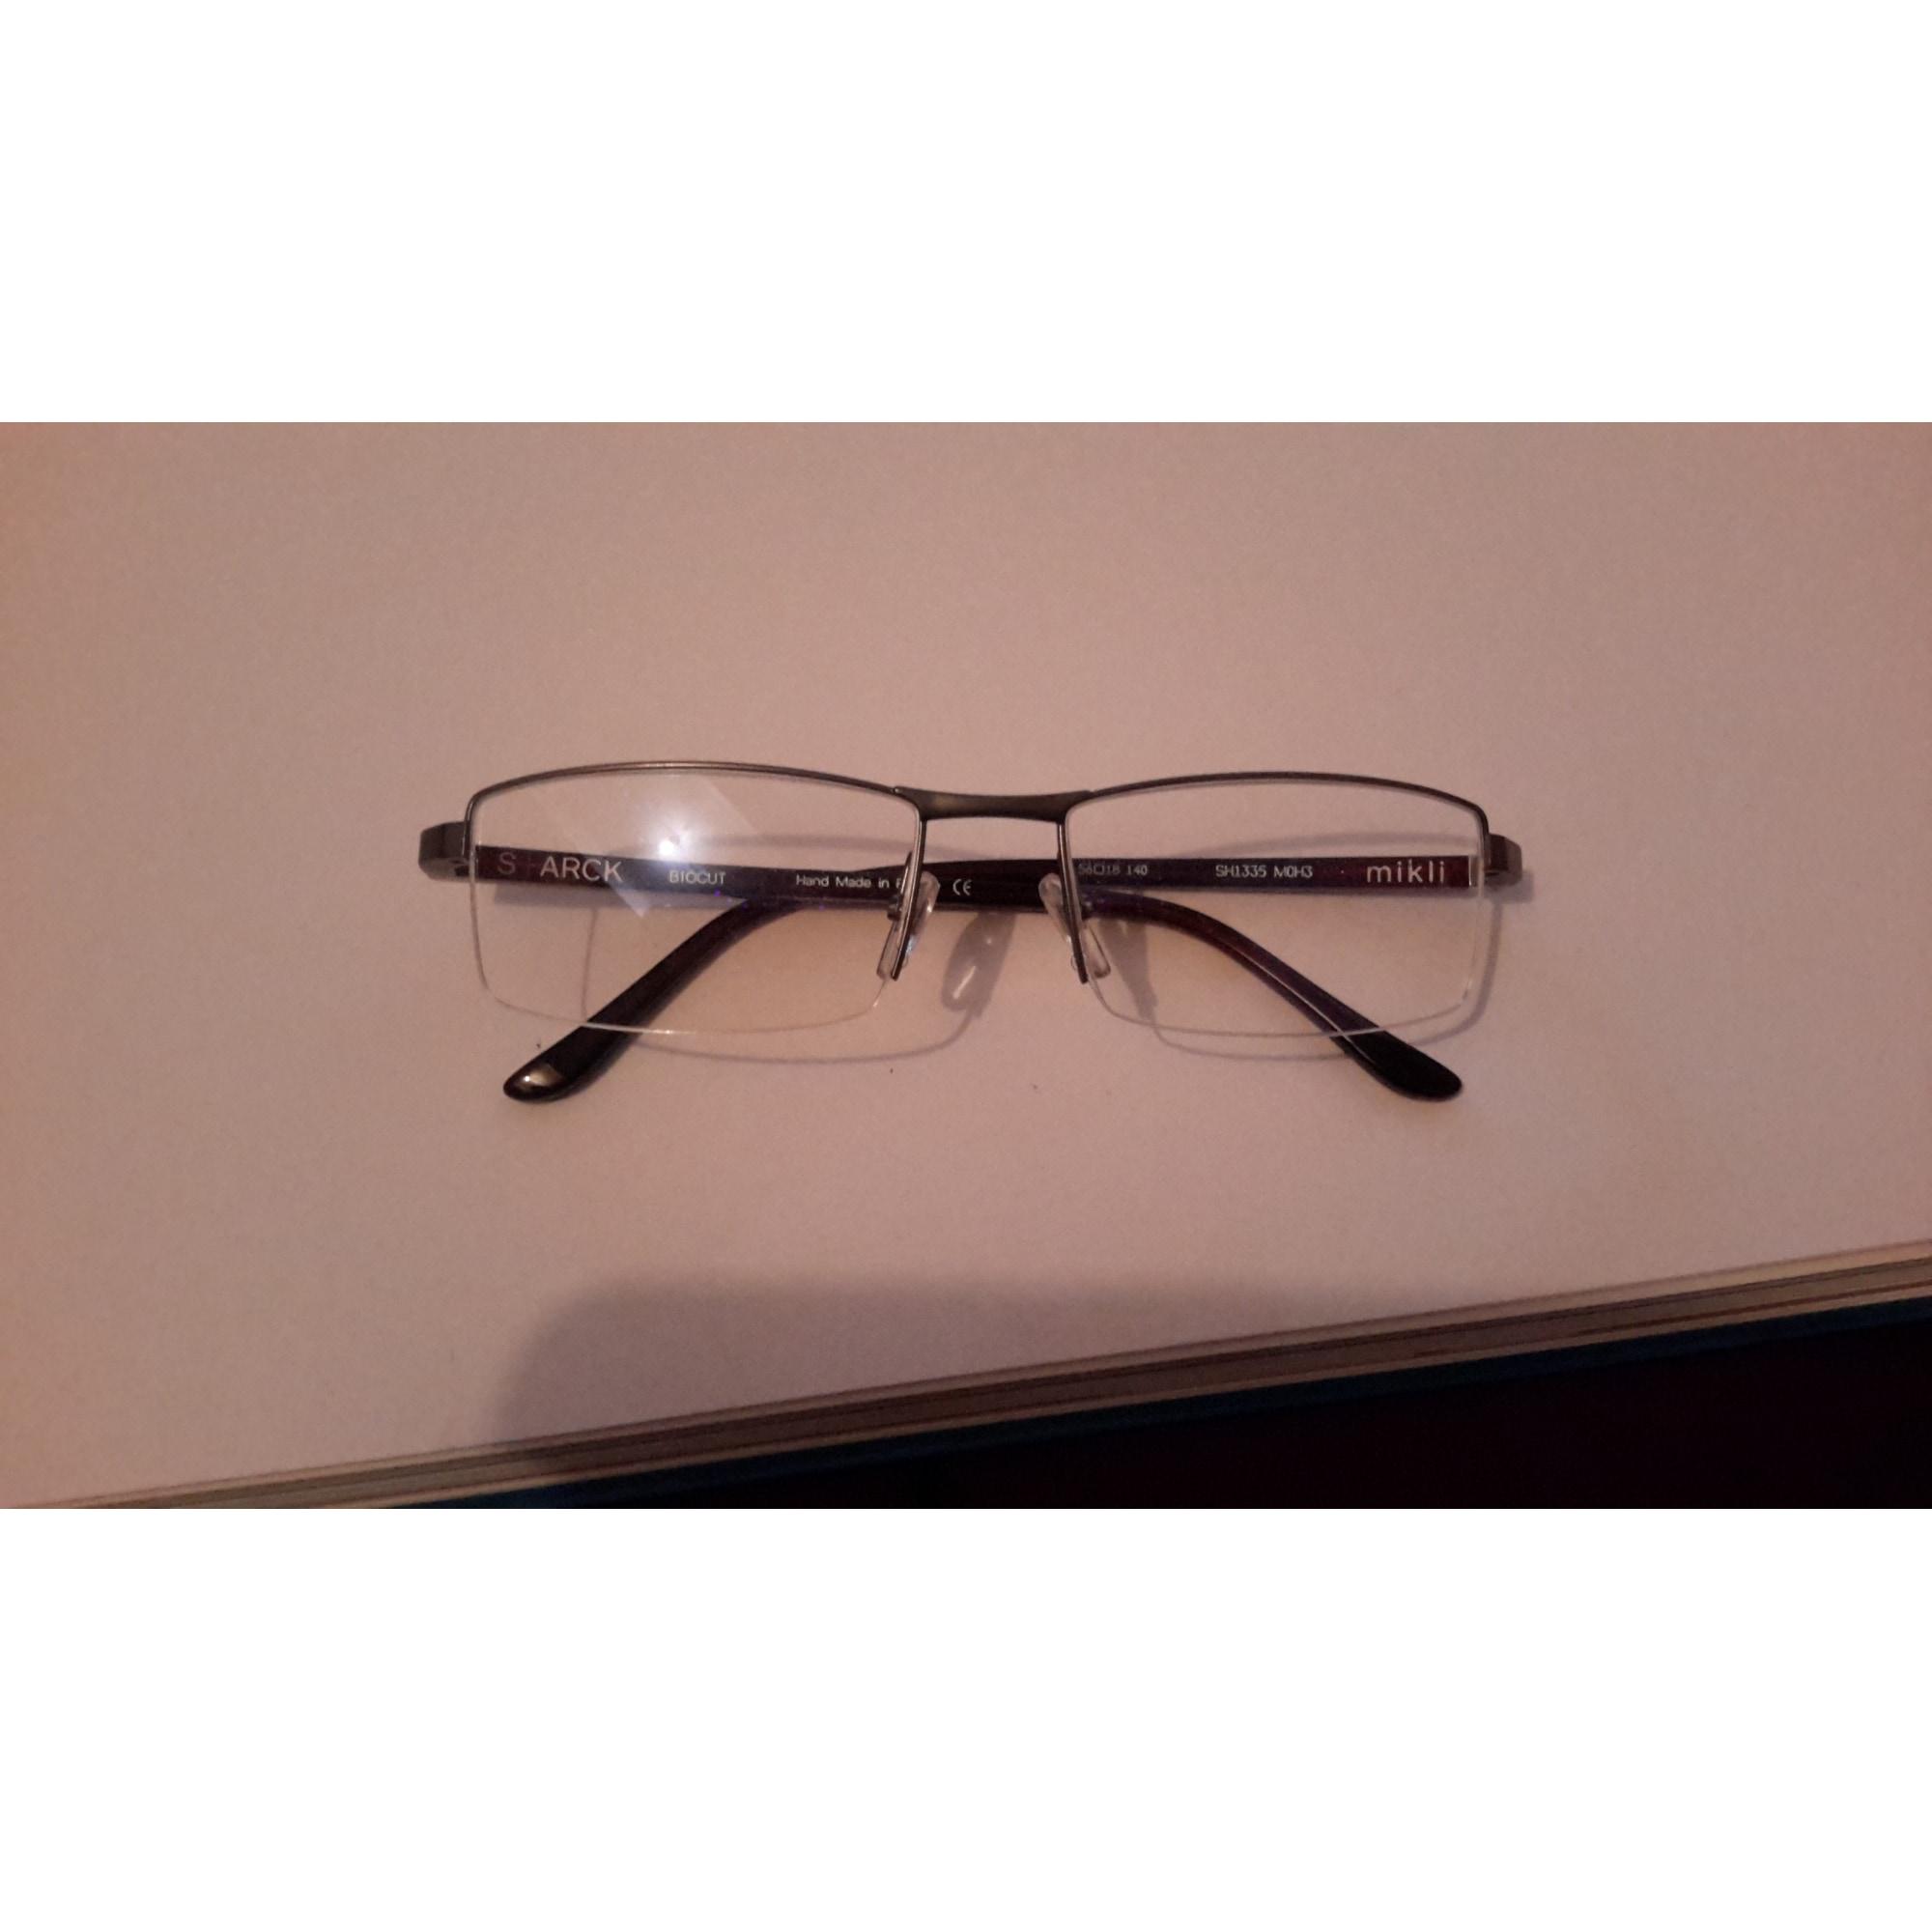 632cf521bdd Monture de lunettes STARCK EYES rouge - 3291870